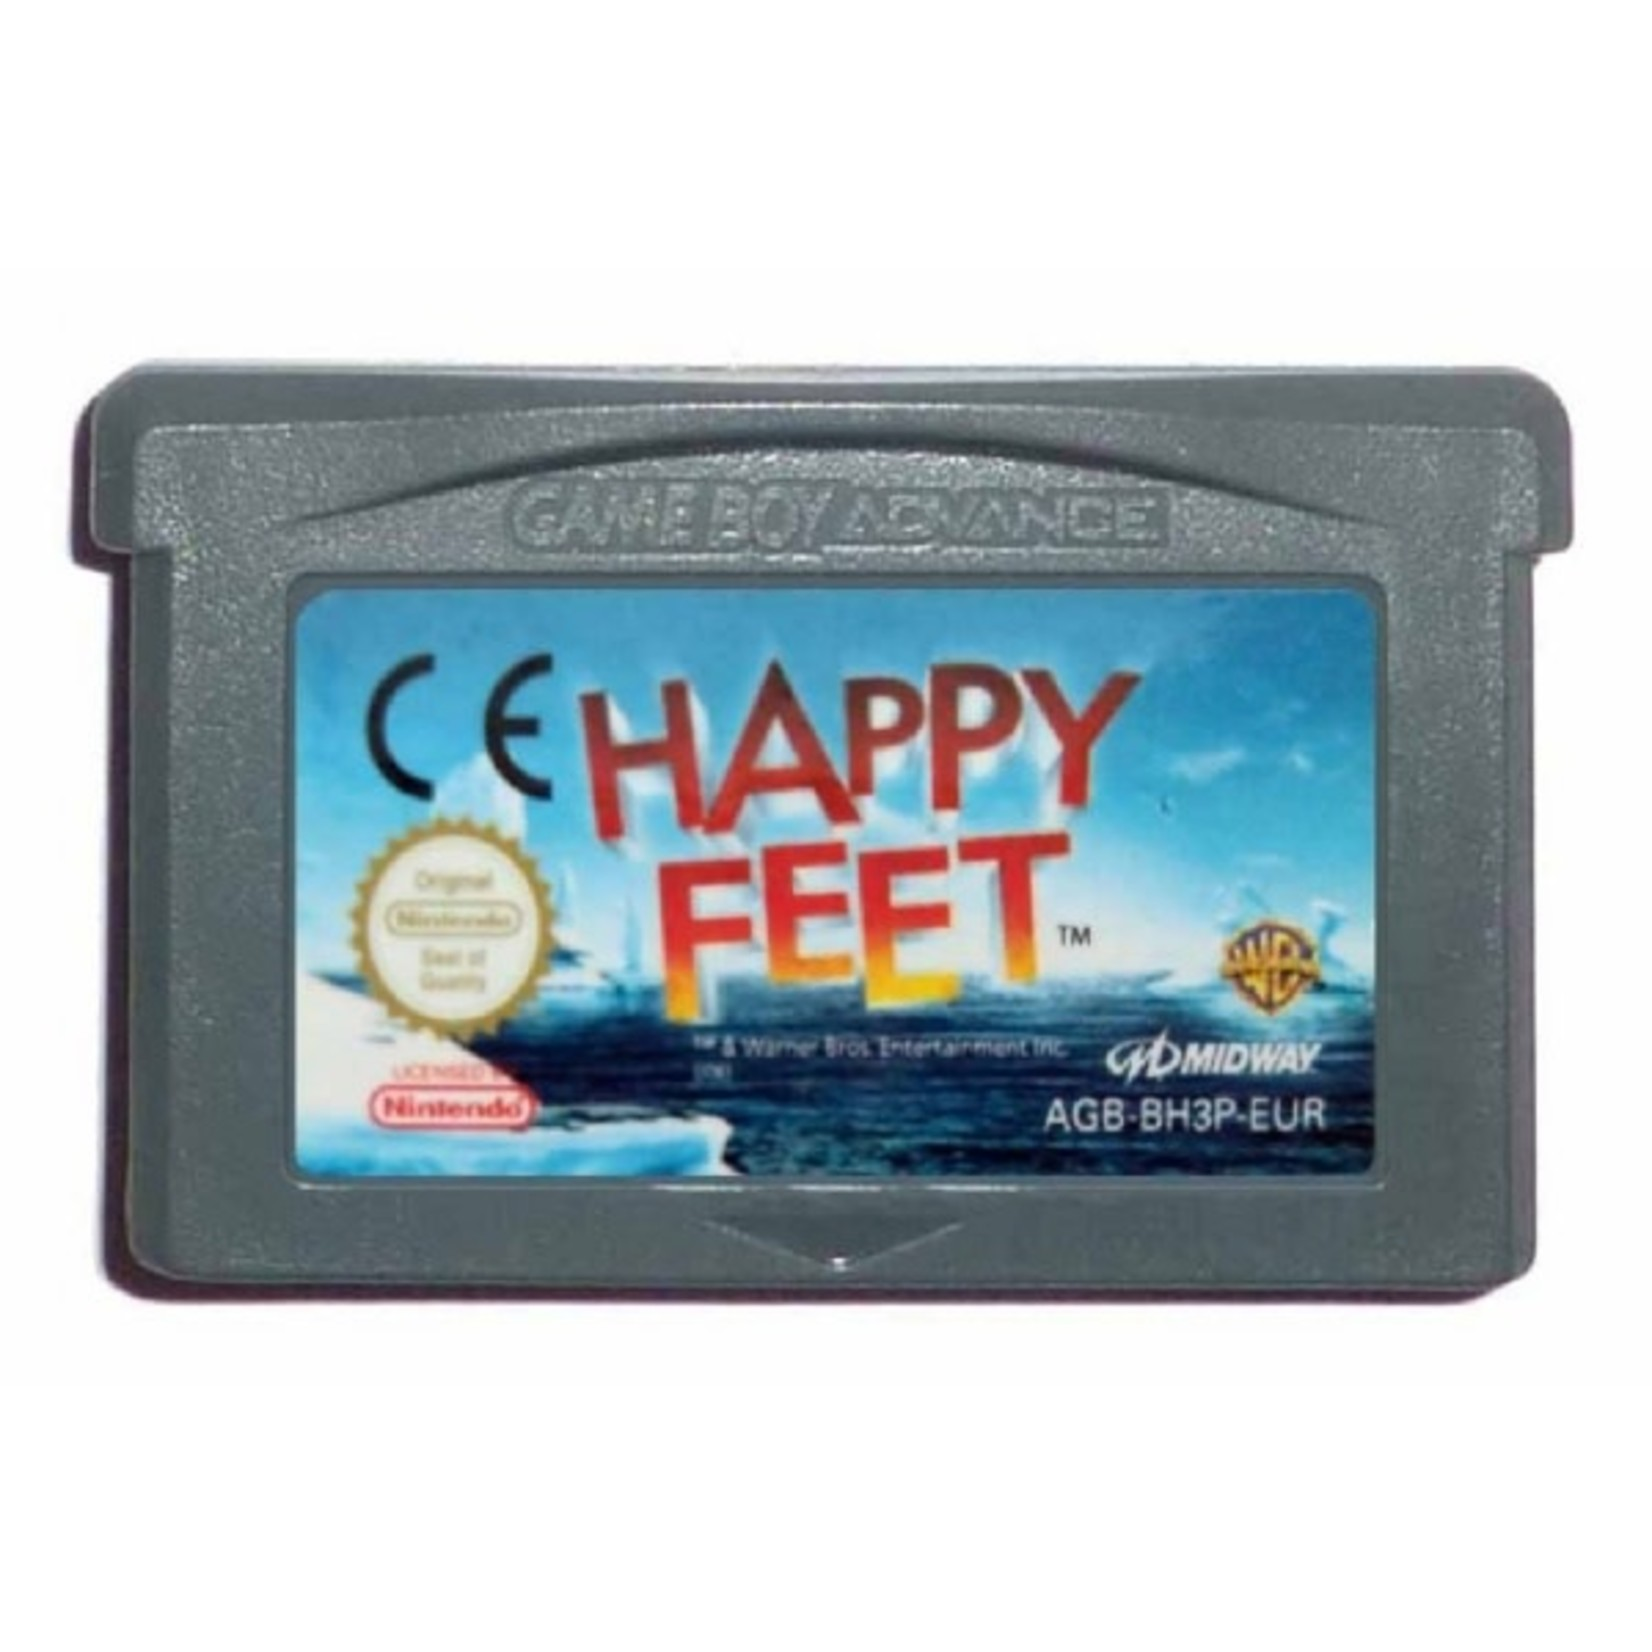 gbau-Happy Feet (cartridge)